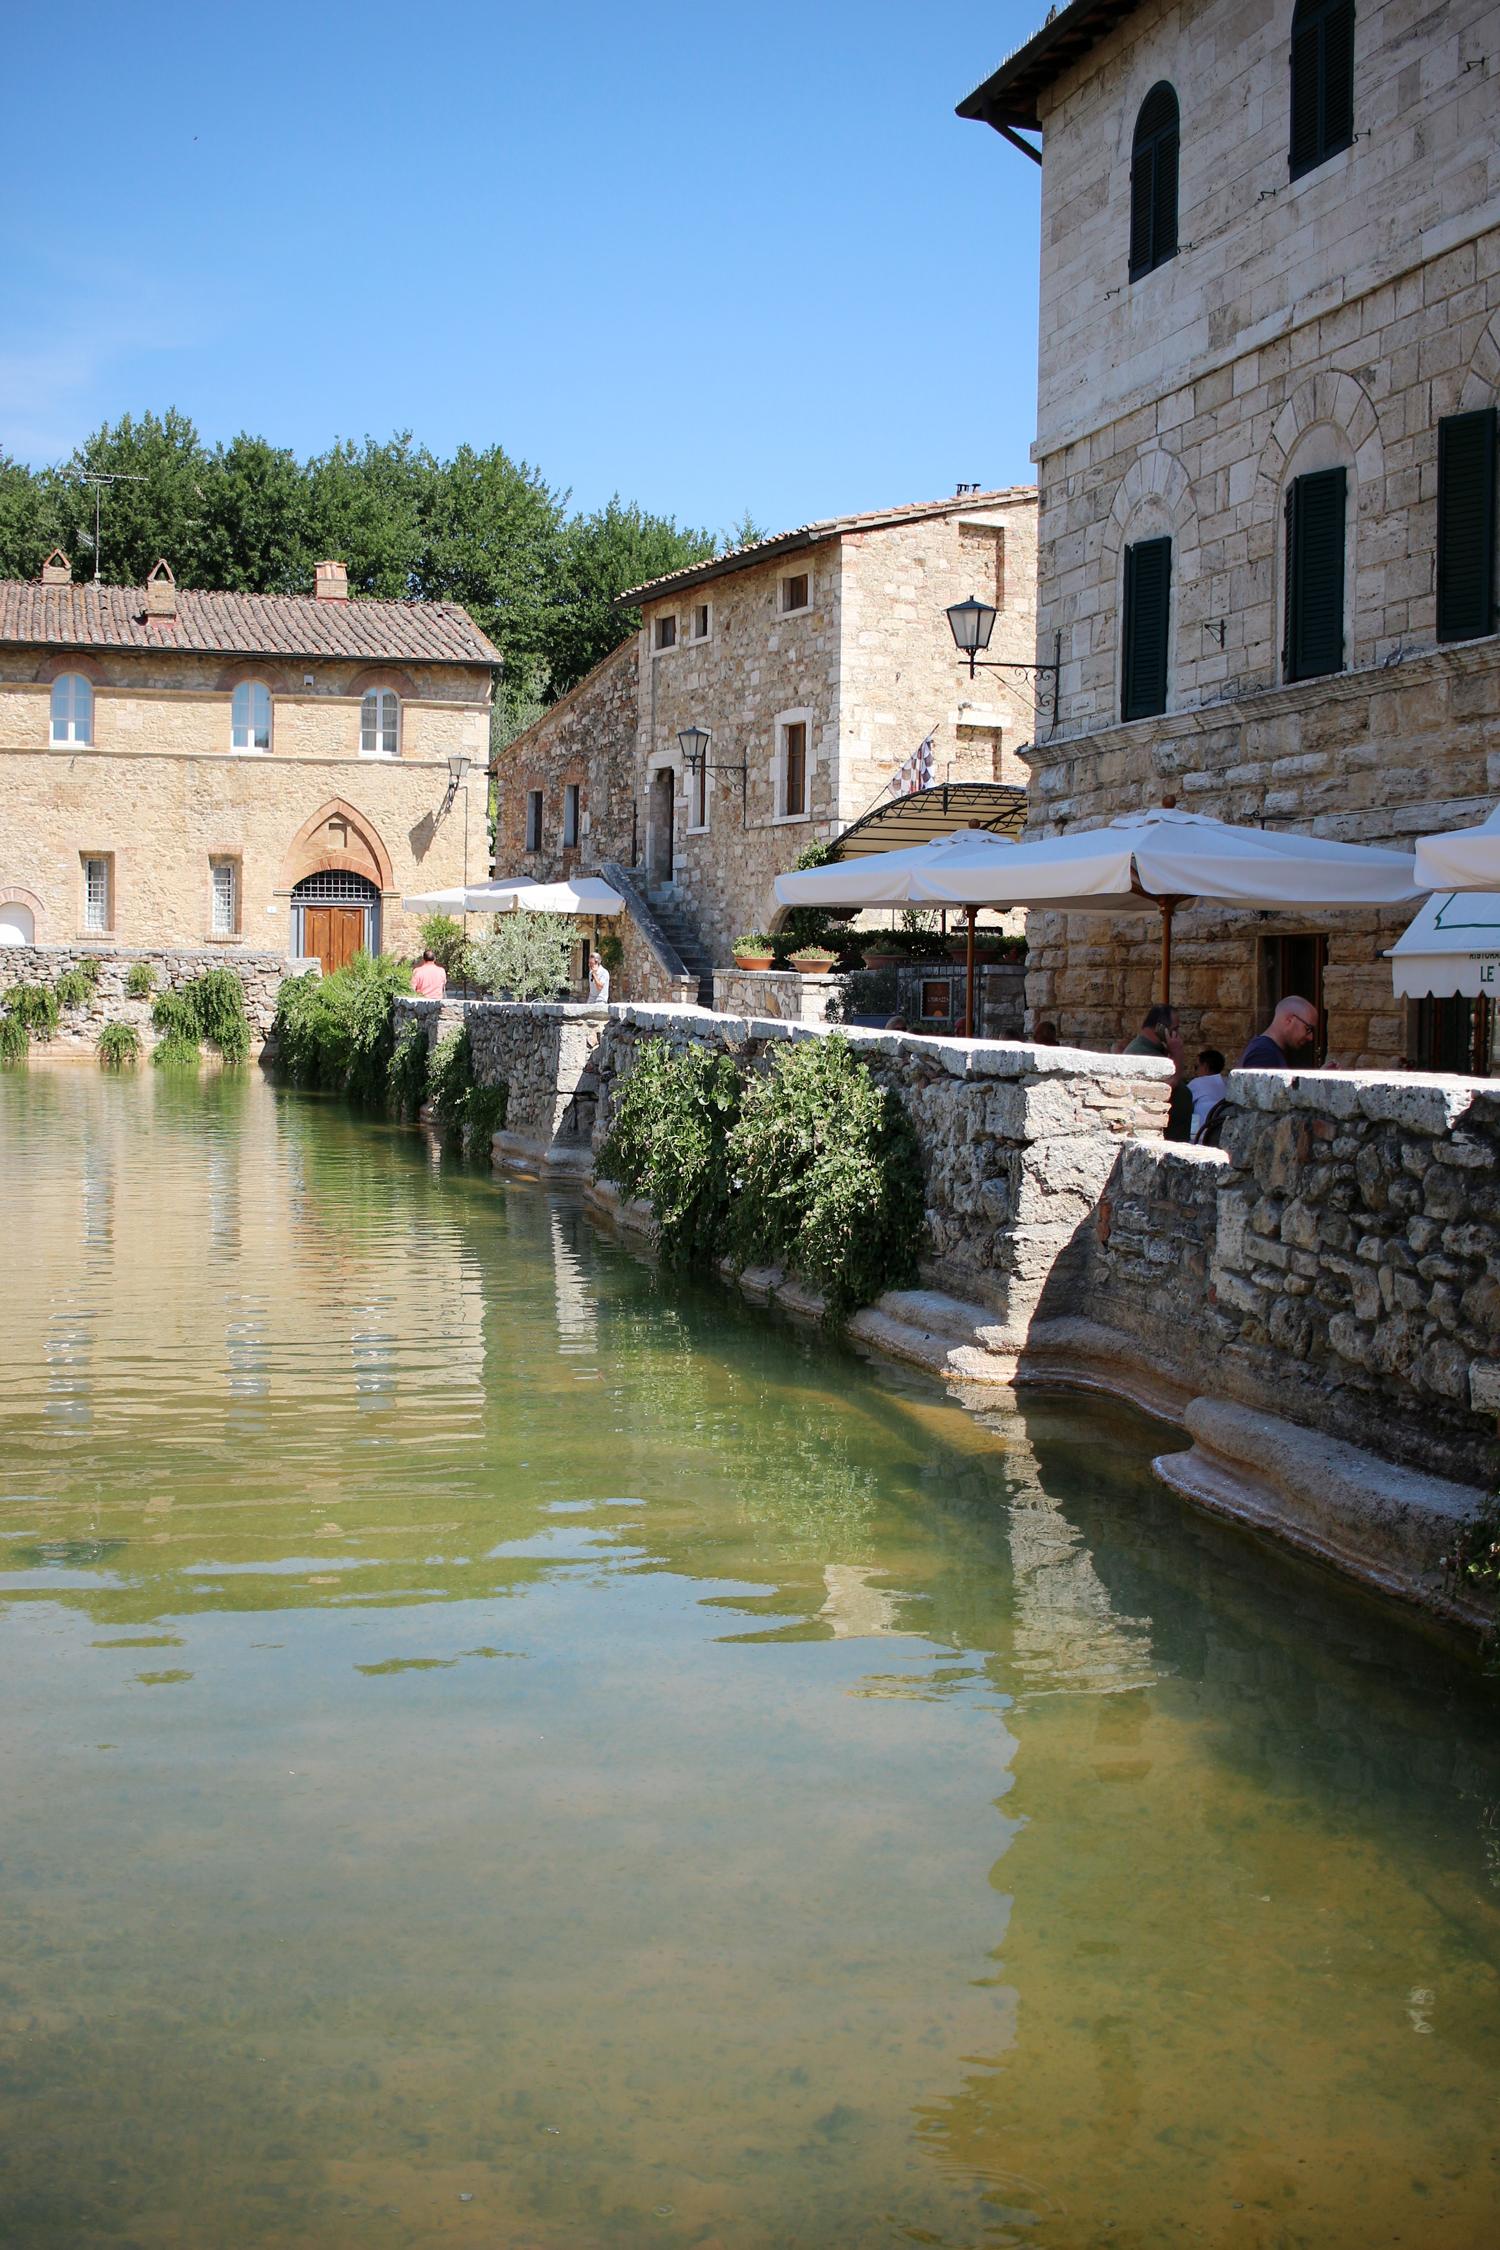 tuscany-bagno-vignoni-italy-travel-blogger-1